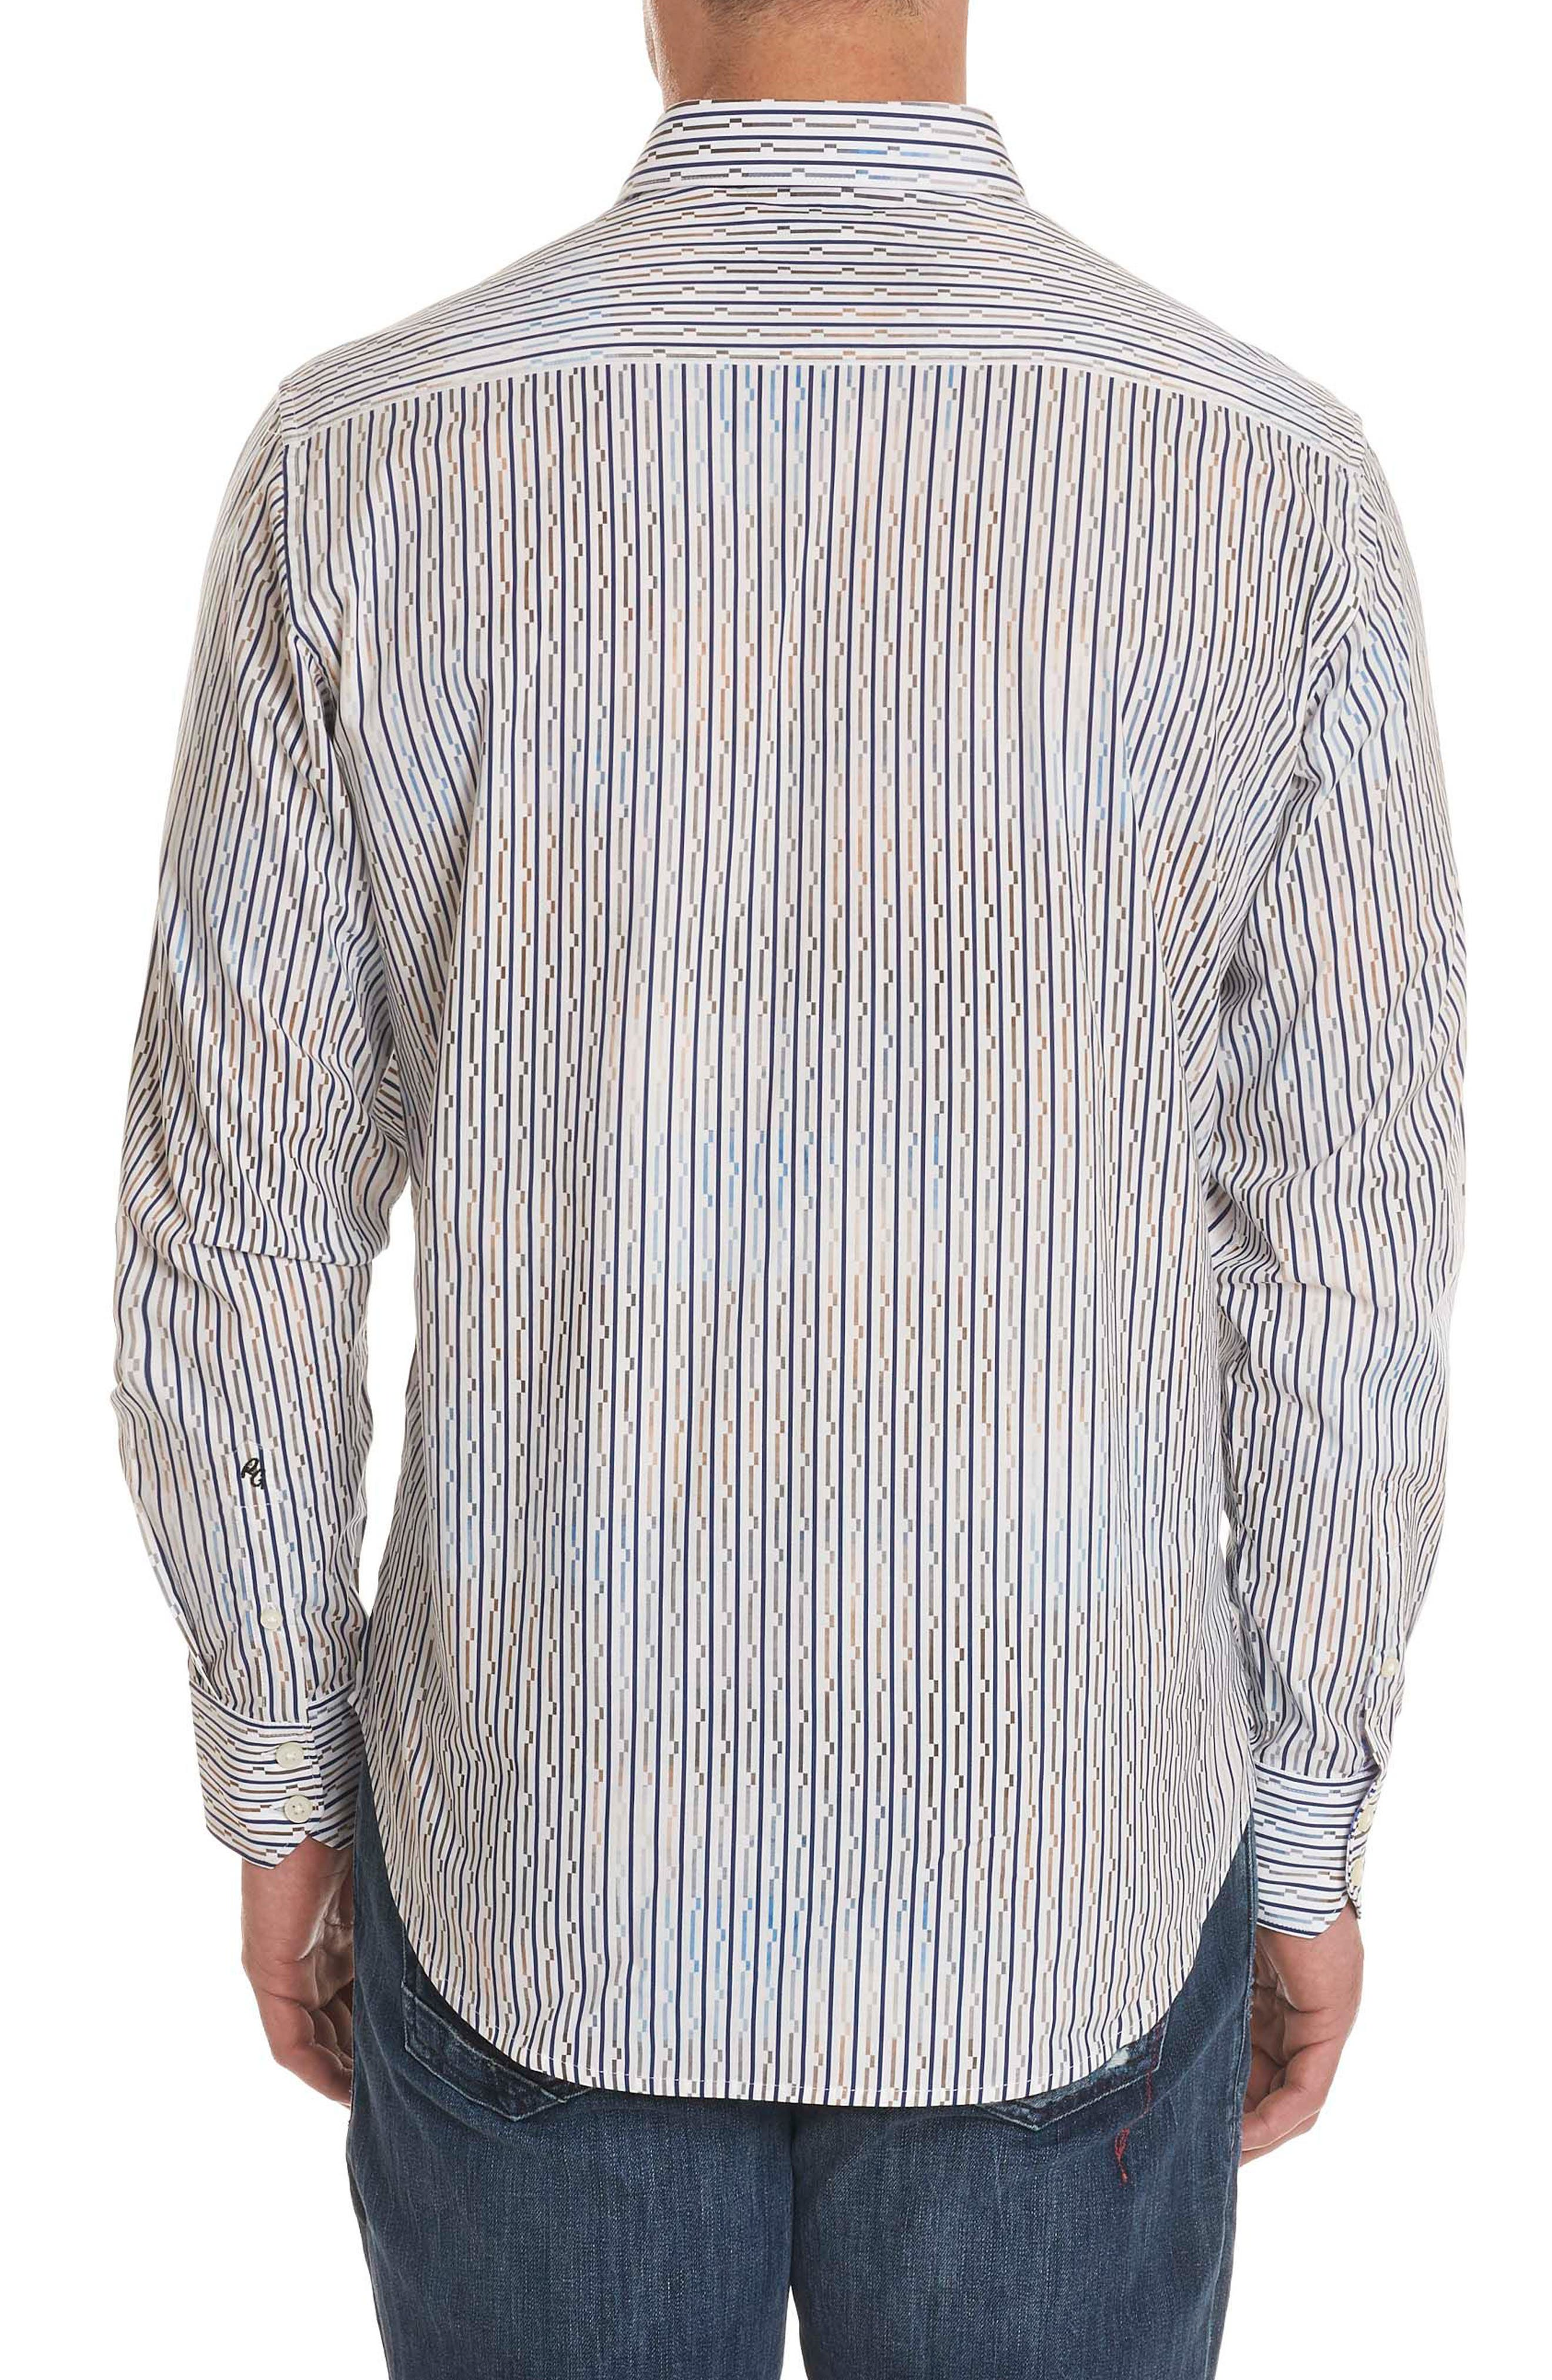 Trinidad Classic Fit Sport Shirt,                             Alternate thumbnail 2, color,                             278